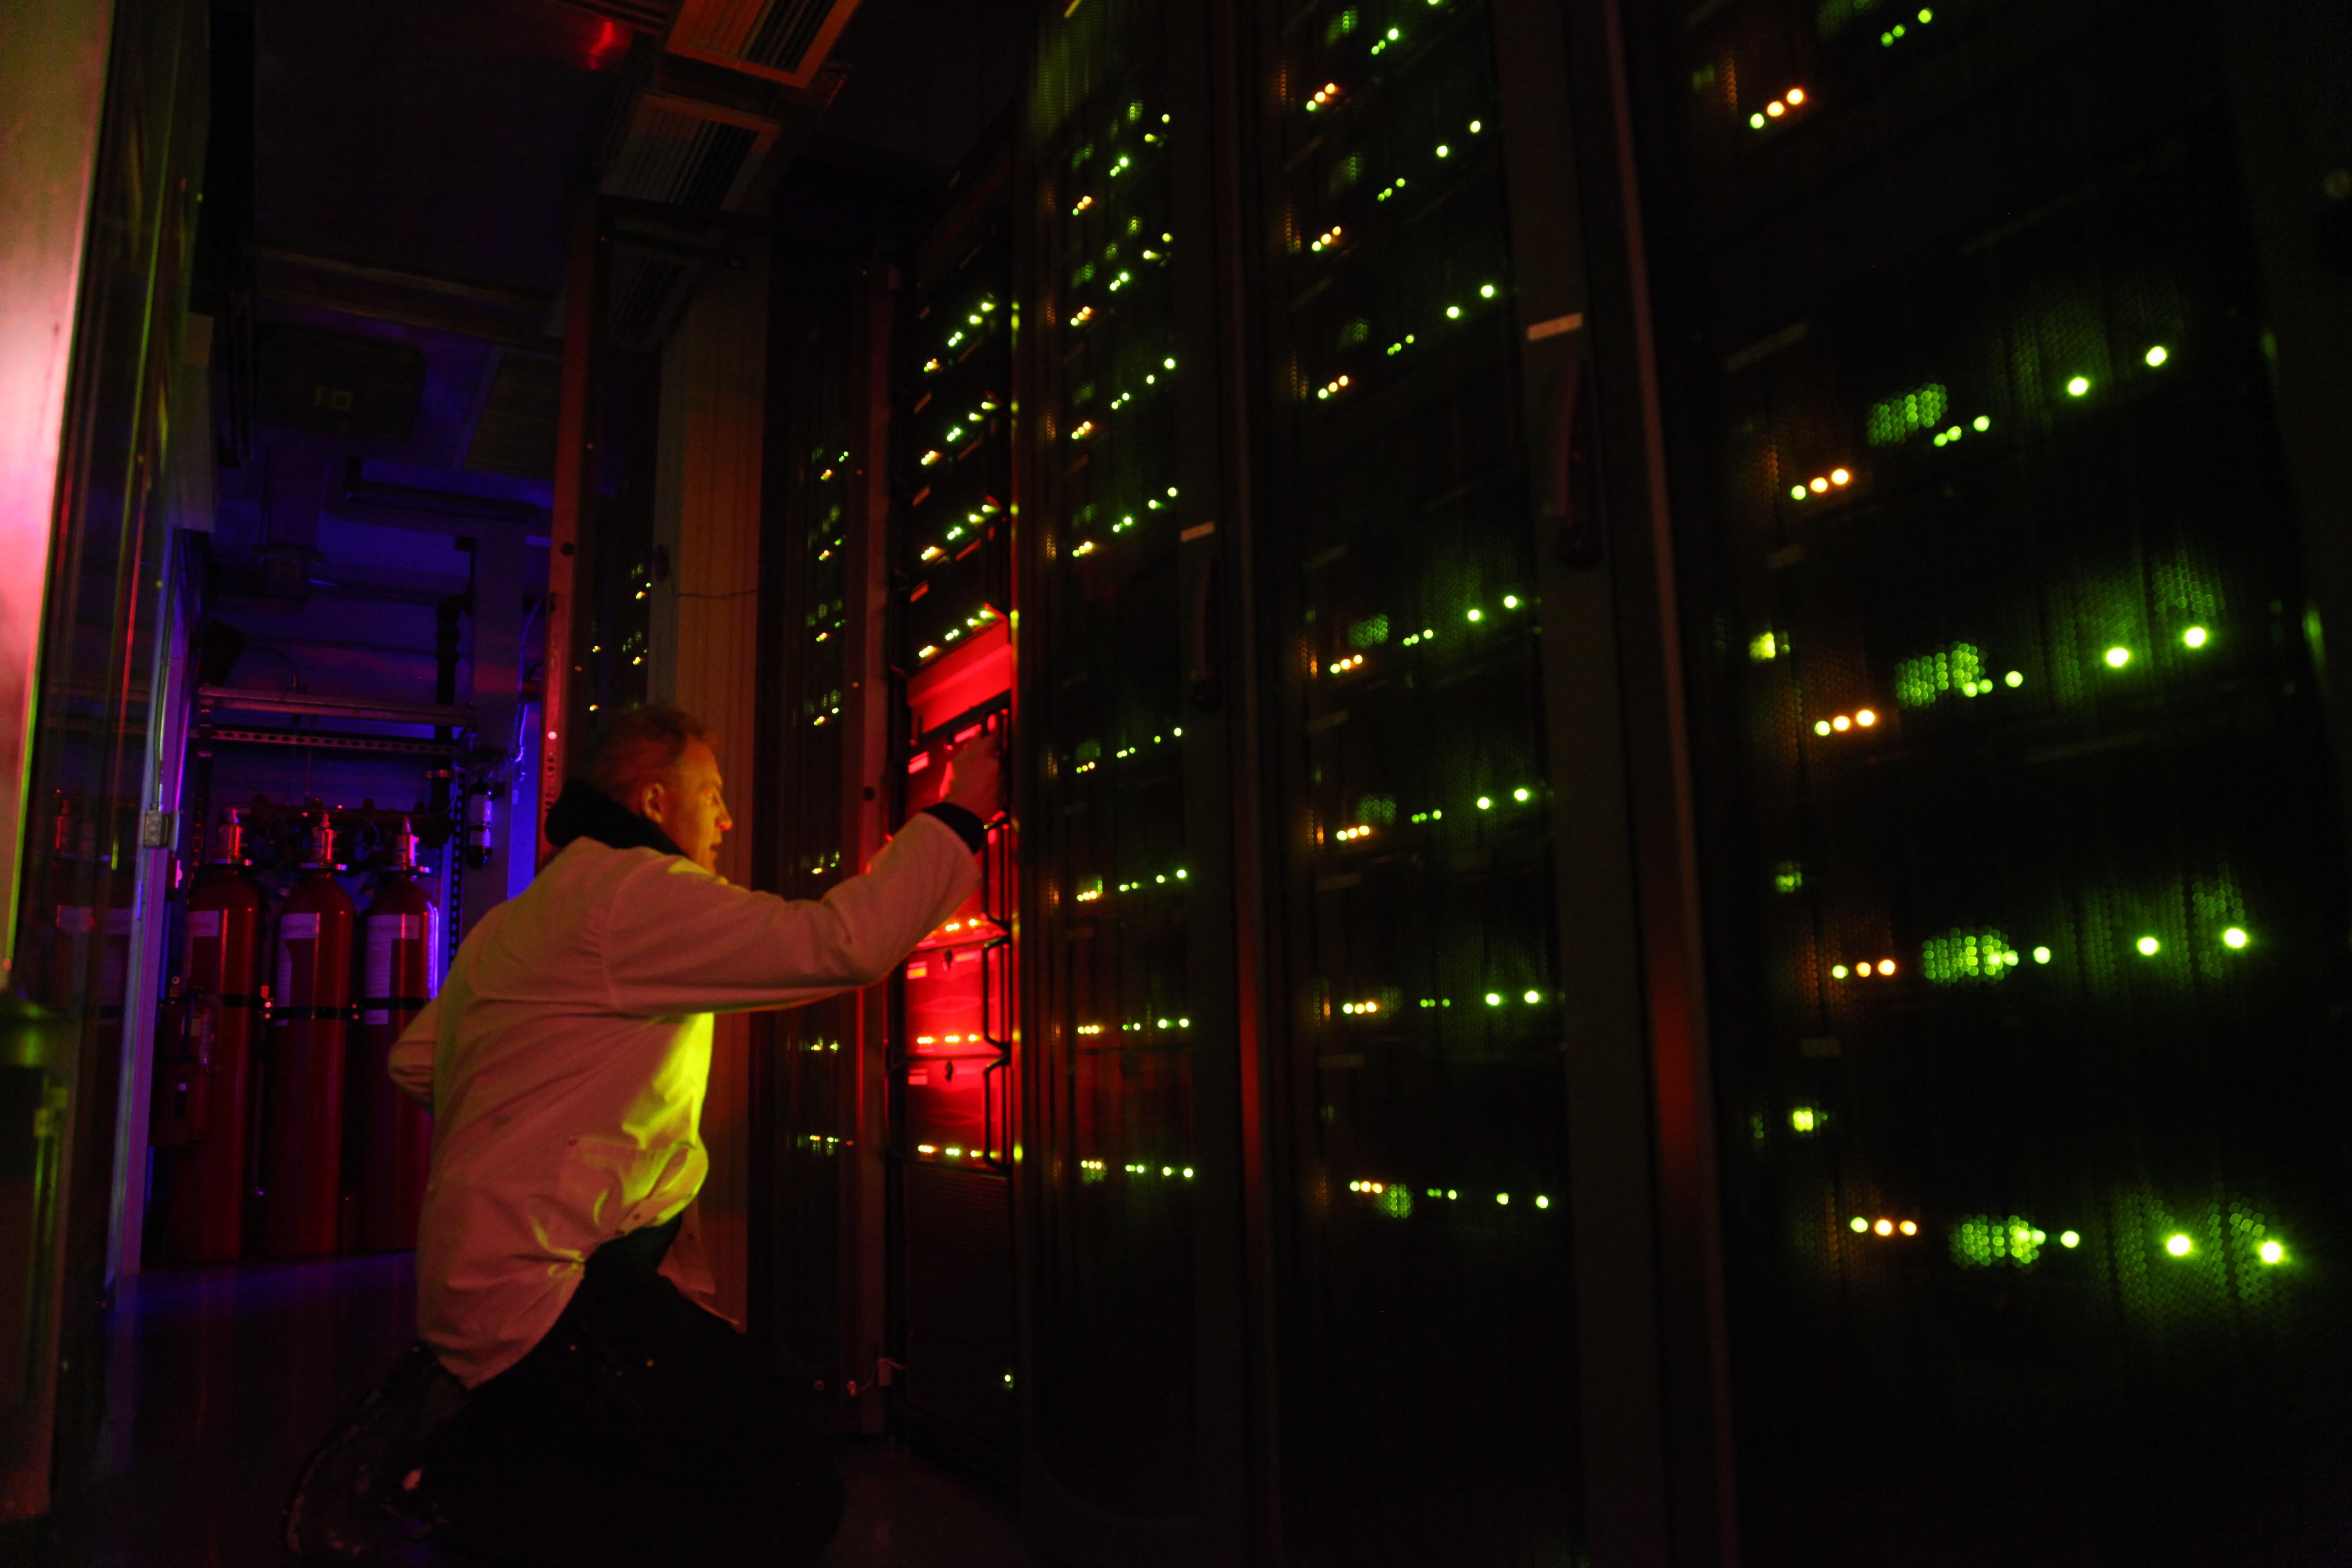 IceCube Lab servers in the dark